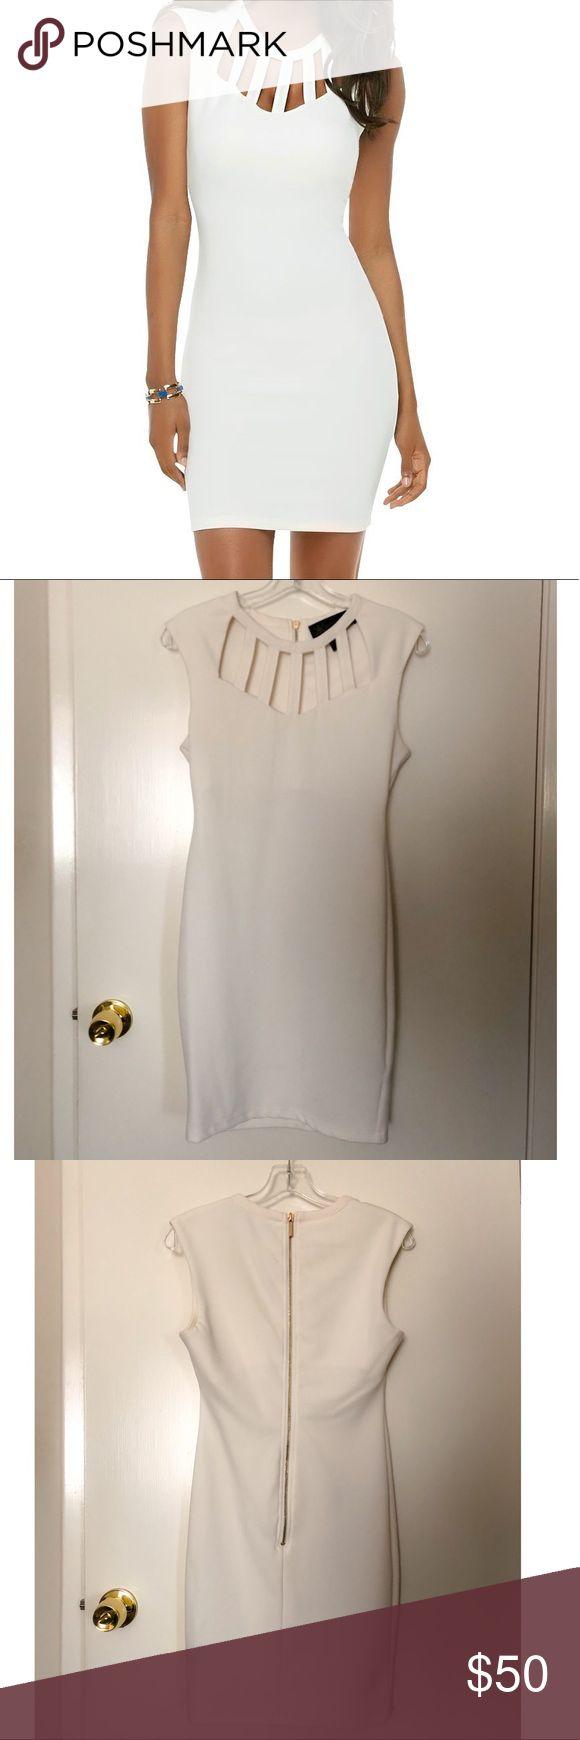 Kardashian Kollection White Dress Excellent condition Kardashian Kollection white dress. Only worn once. Kardashian Kollection Dresses Mini